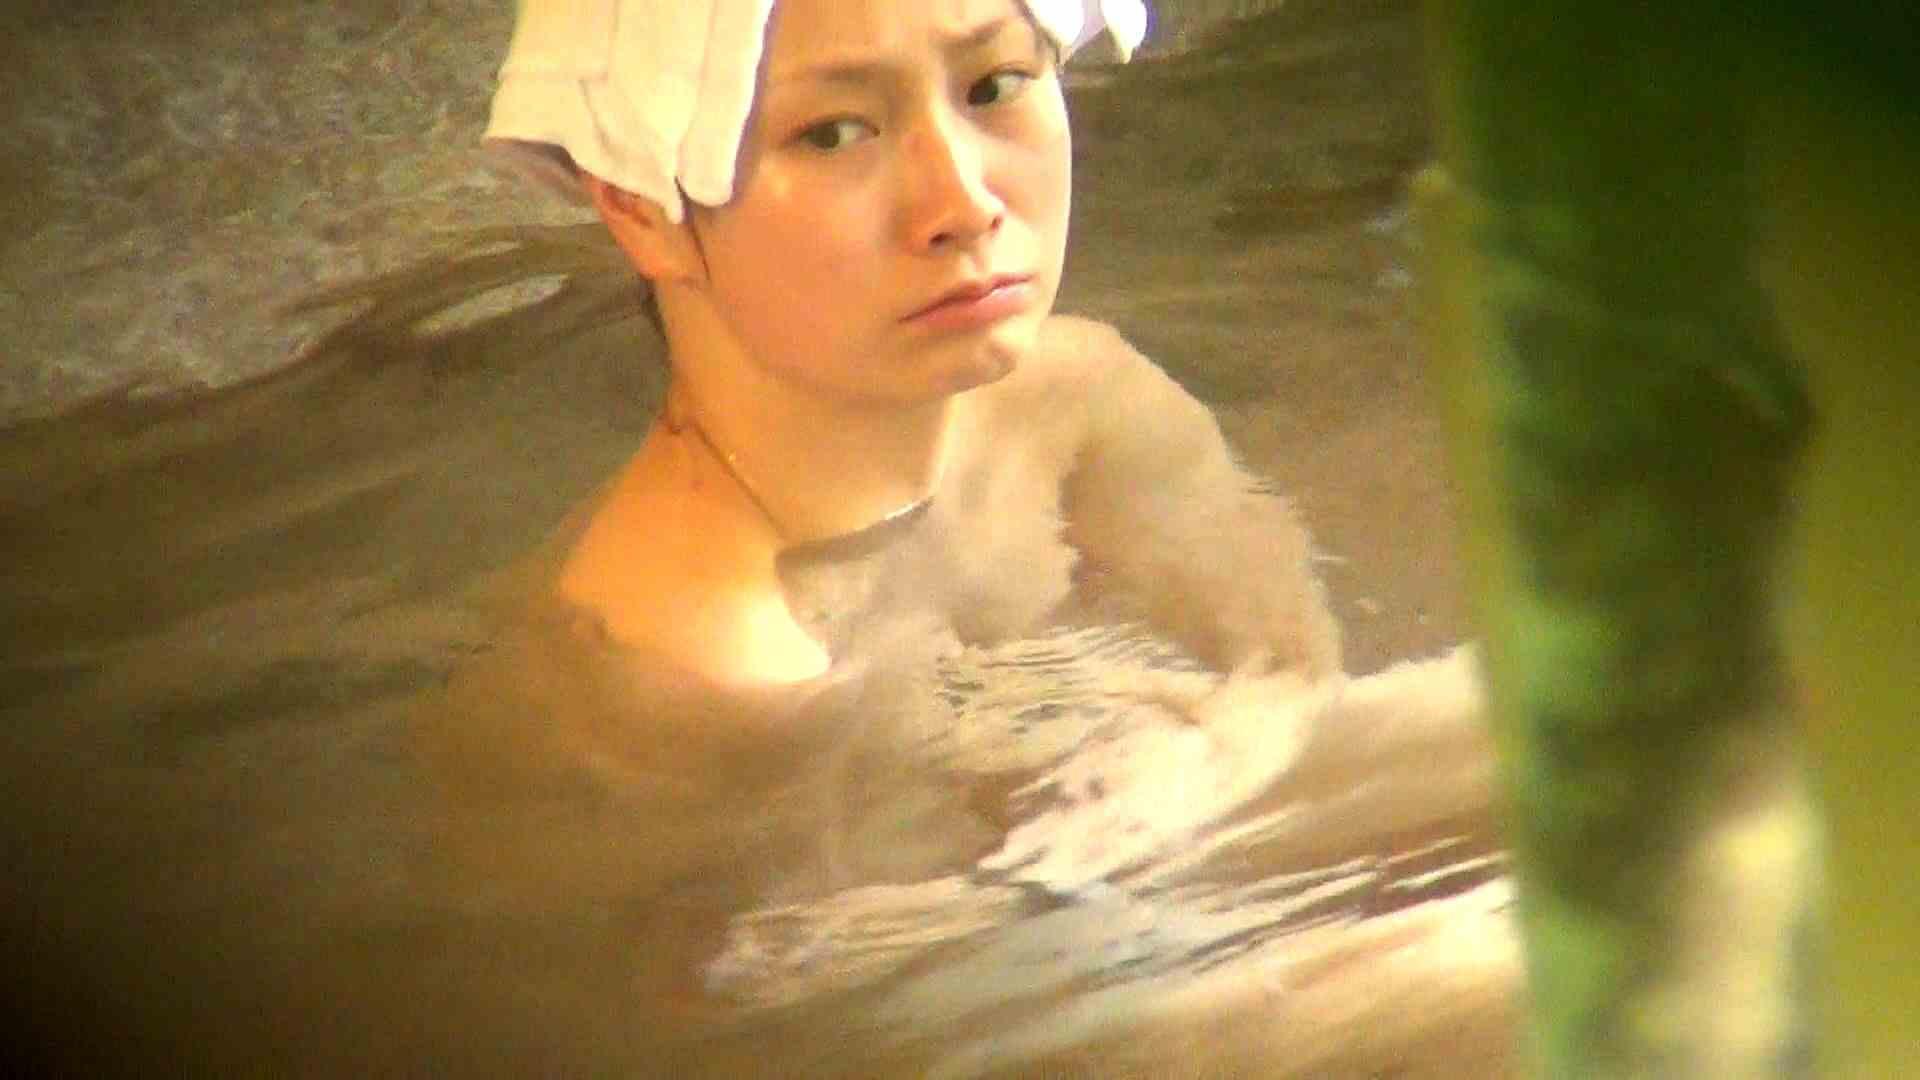 Aquaな露天風呂Vol.266 盗撮映像  83Pix 74